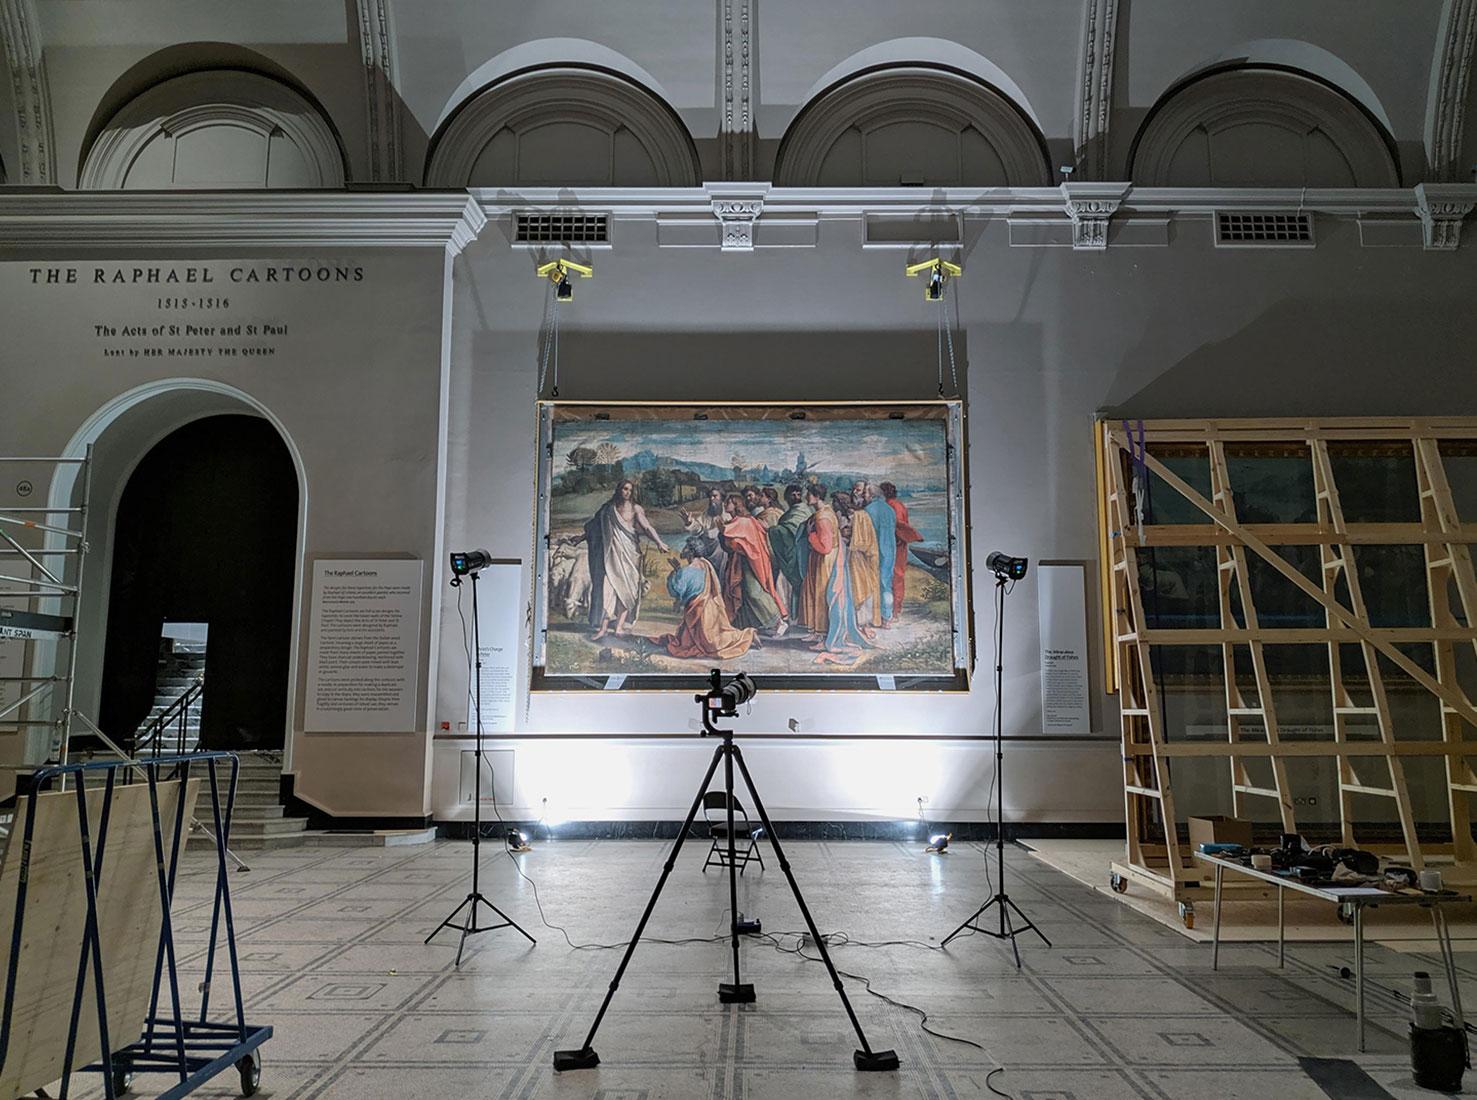 музеи онлайн фото